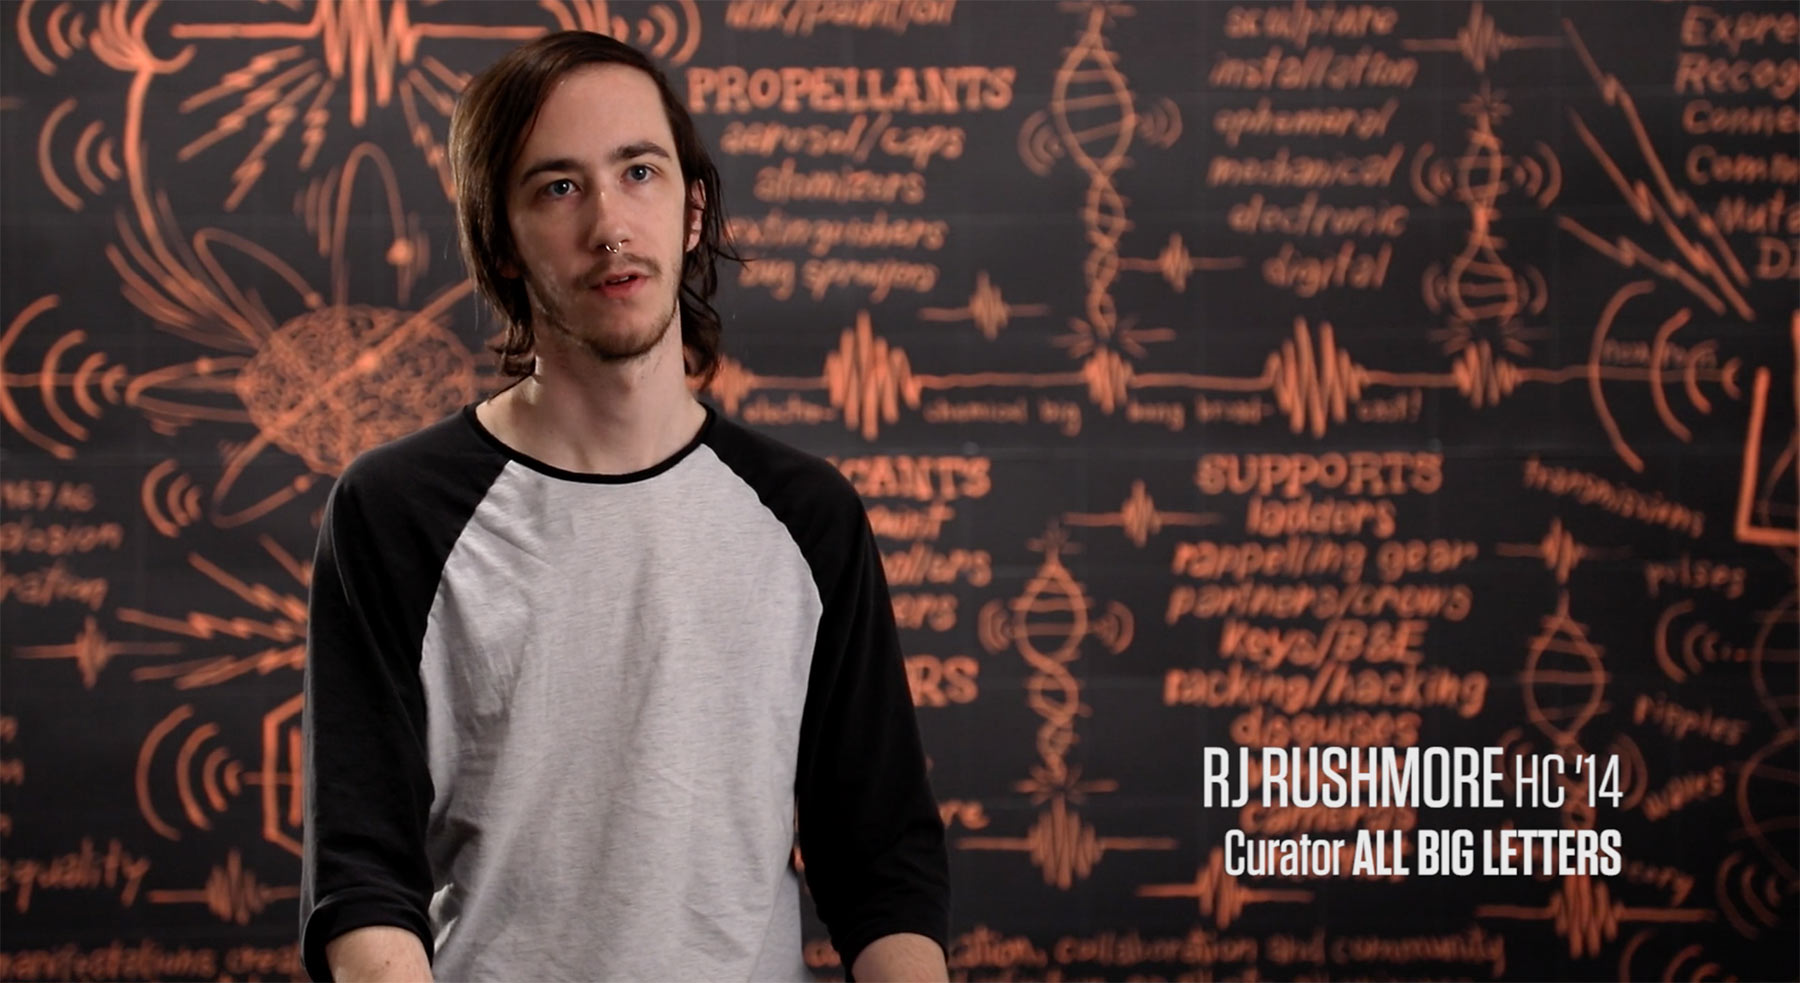 RJ Rushmore being interviewed